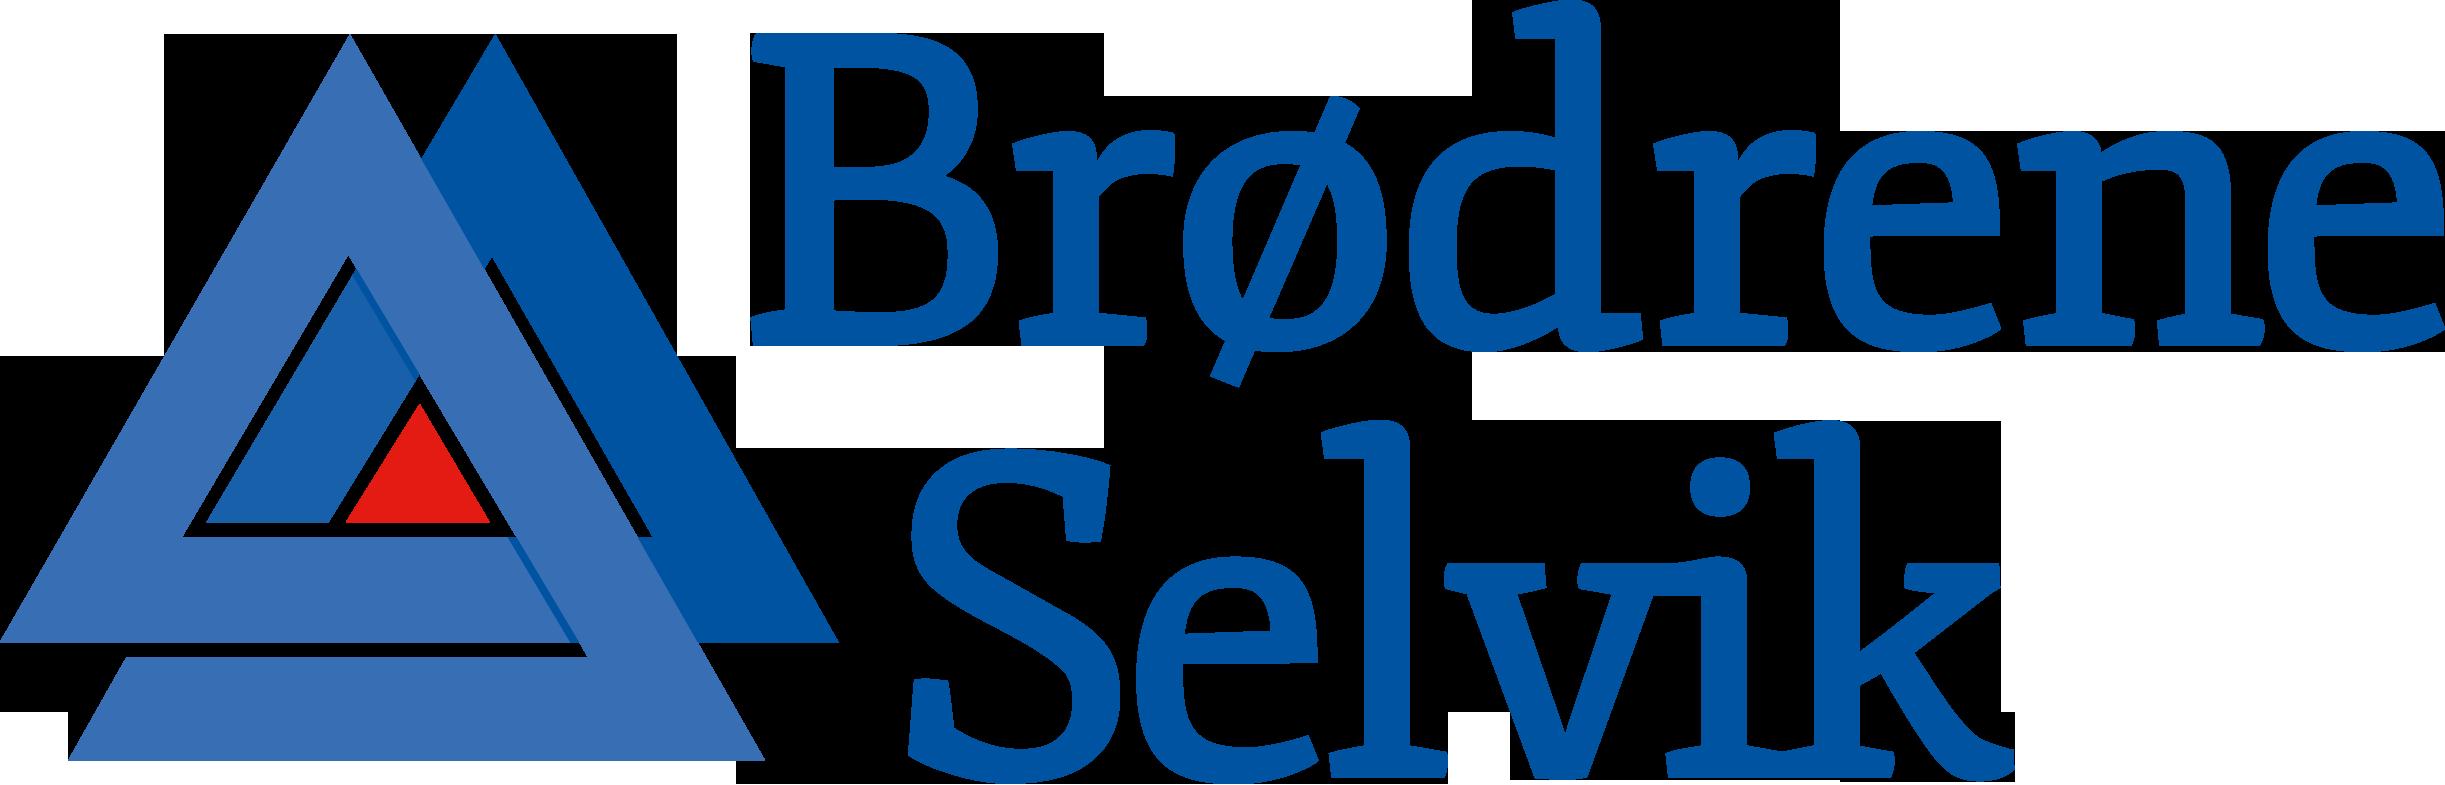 Brødrene Selvik logo